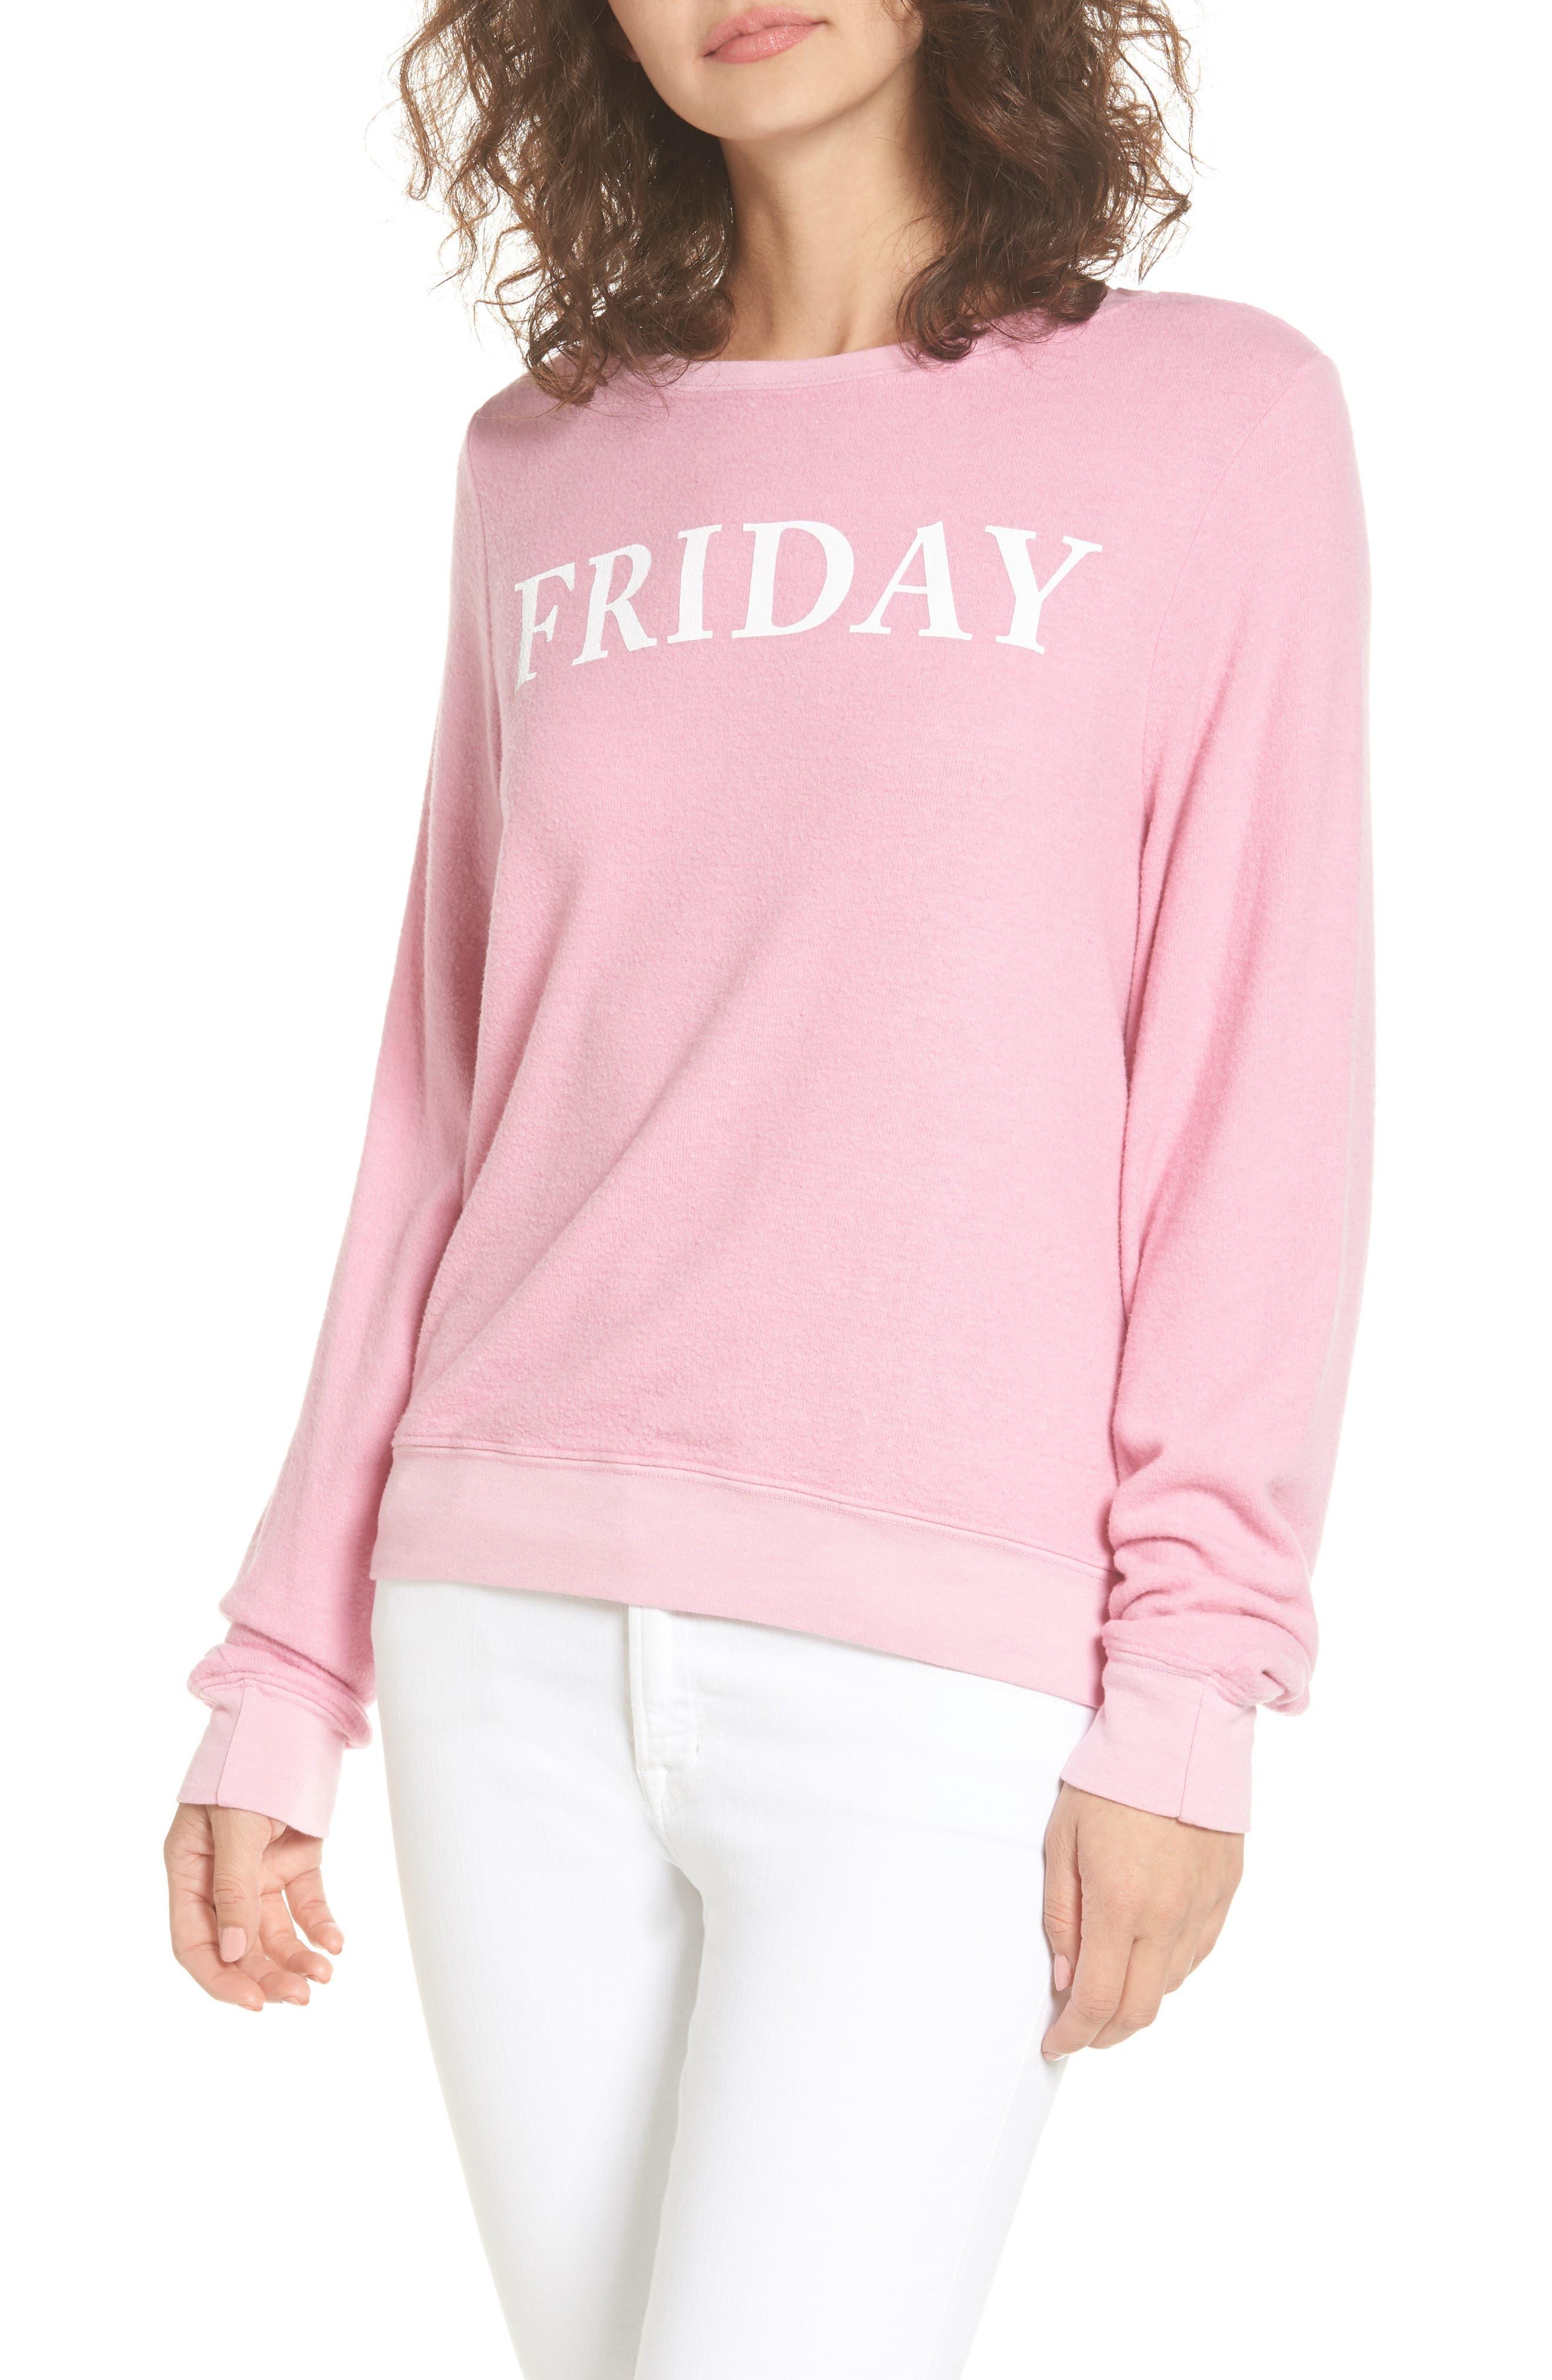 Friday Sweatshirt,                         Main,                         color, 650